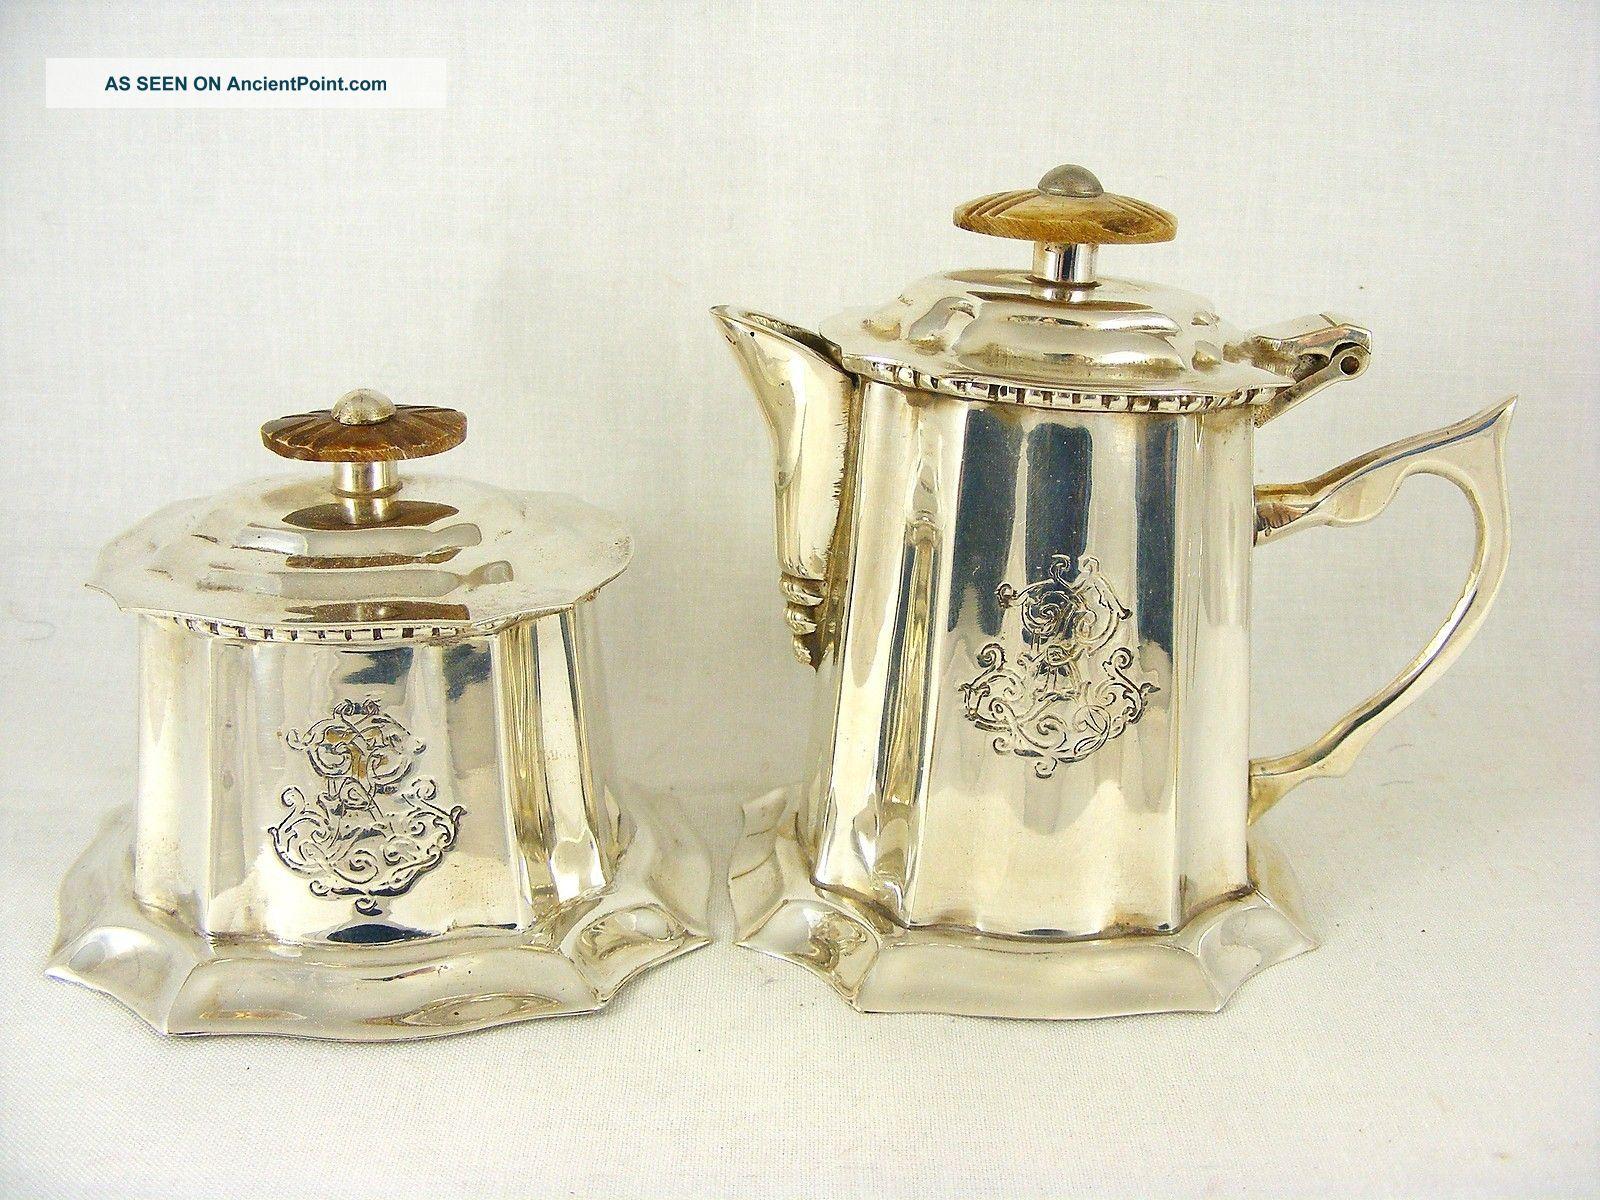 Silver Plated Royal Sheffield Miniature Teapot & Sugar Pot Engraved Tea/Coffee Pots & Sets photo